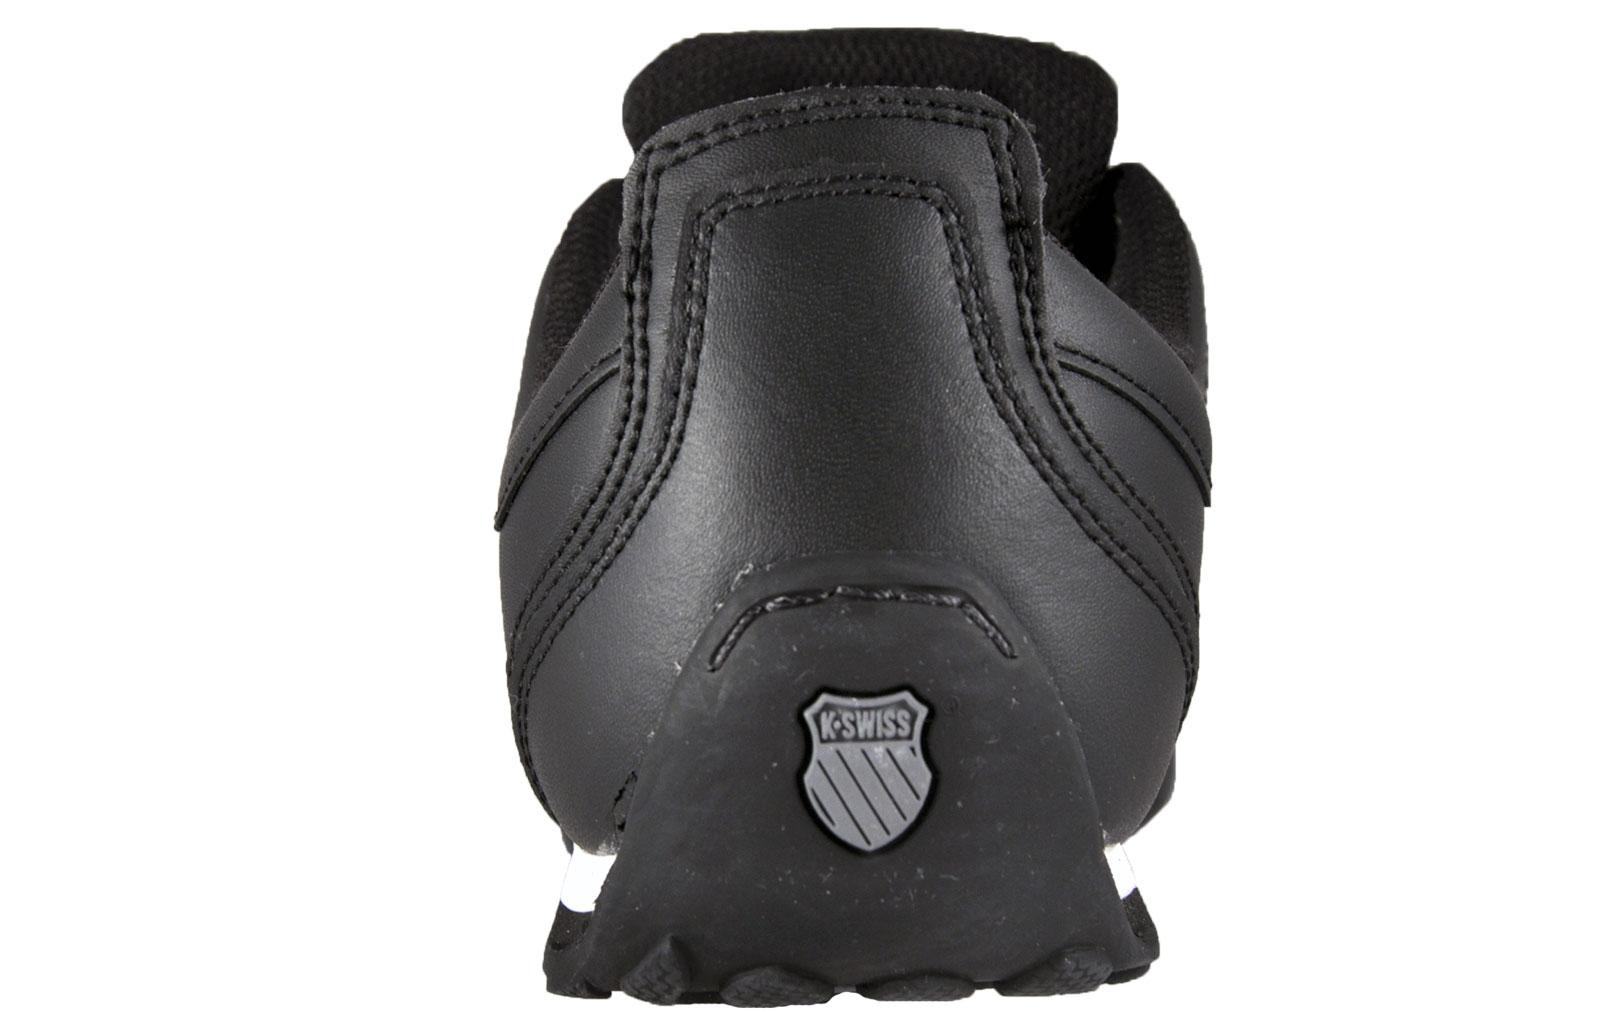 783cc5a9bfa905 K Swiss Arvee 1.5 Men s Classic Casual Retro Athletic Fashion Trainers Black